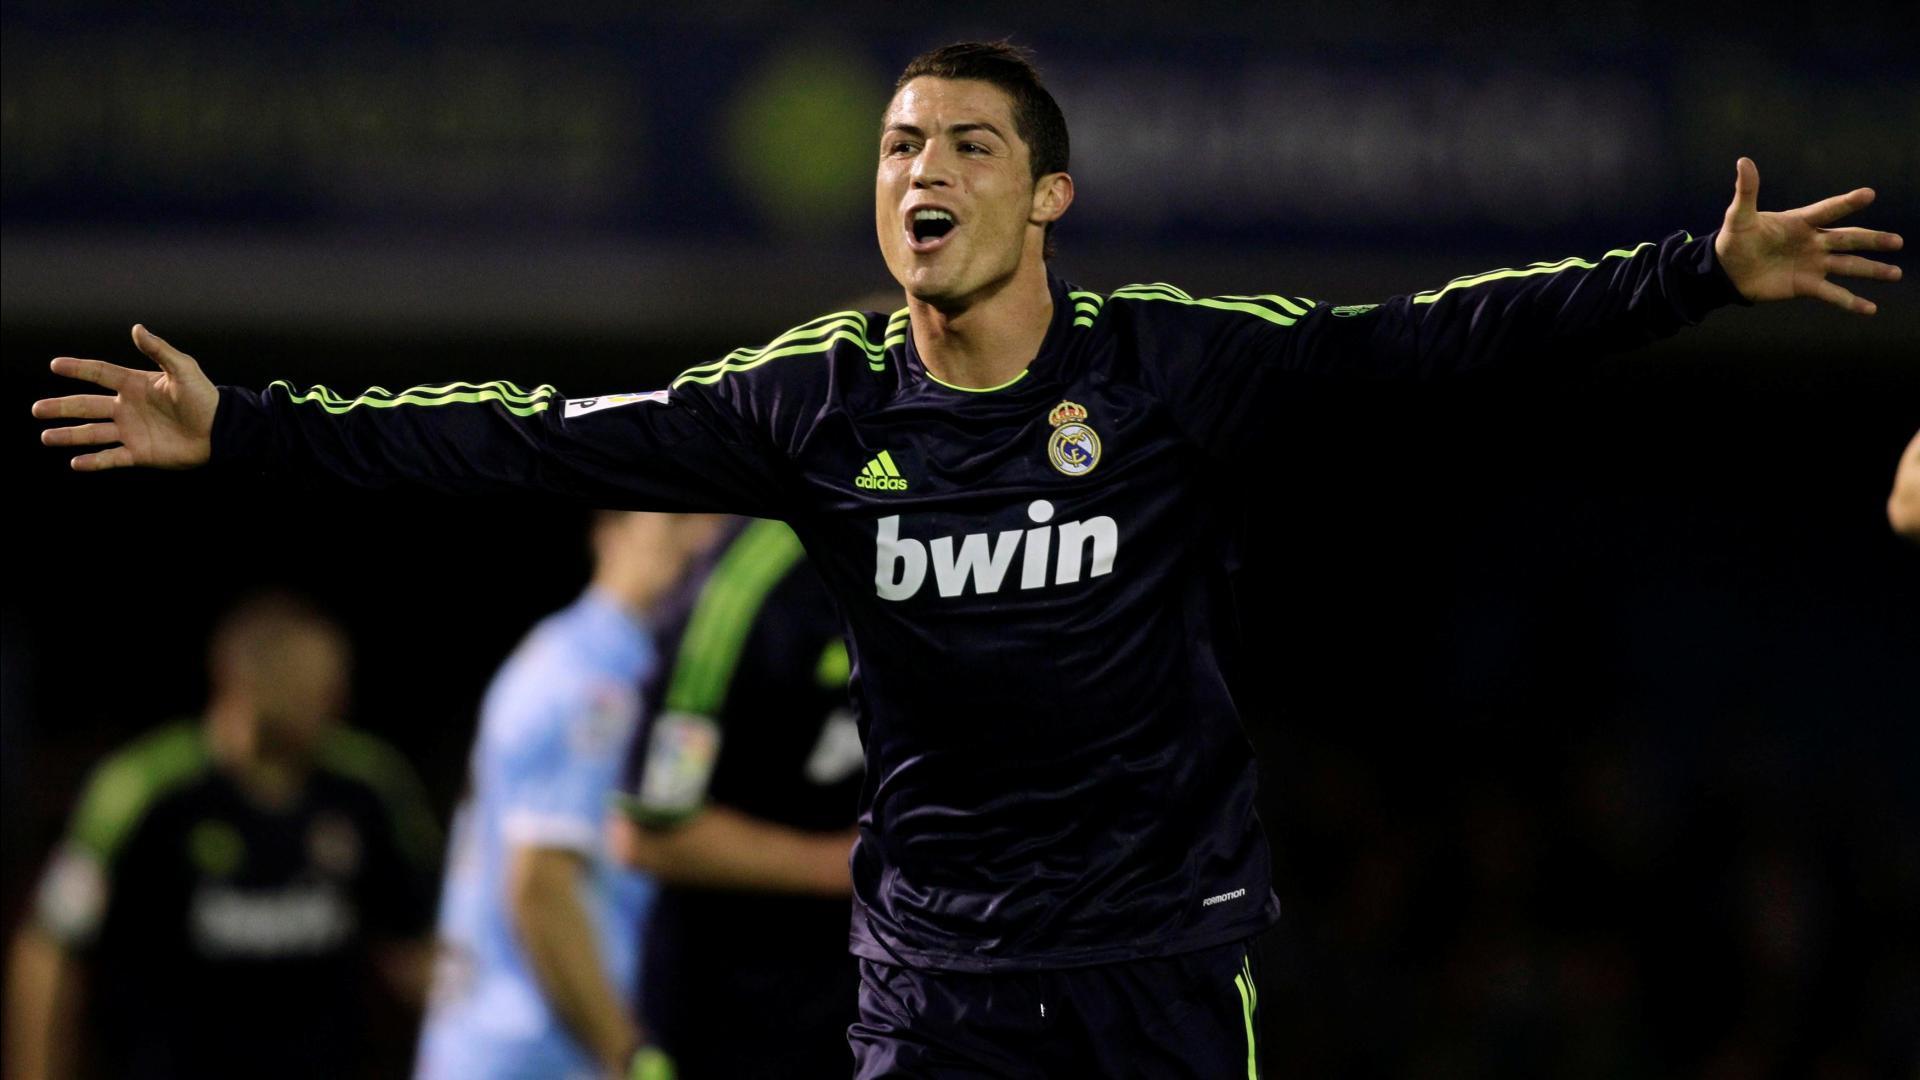 Cristiano Ronaldo celebrating a goal wallpaper